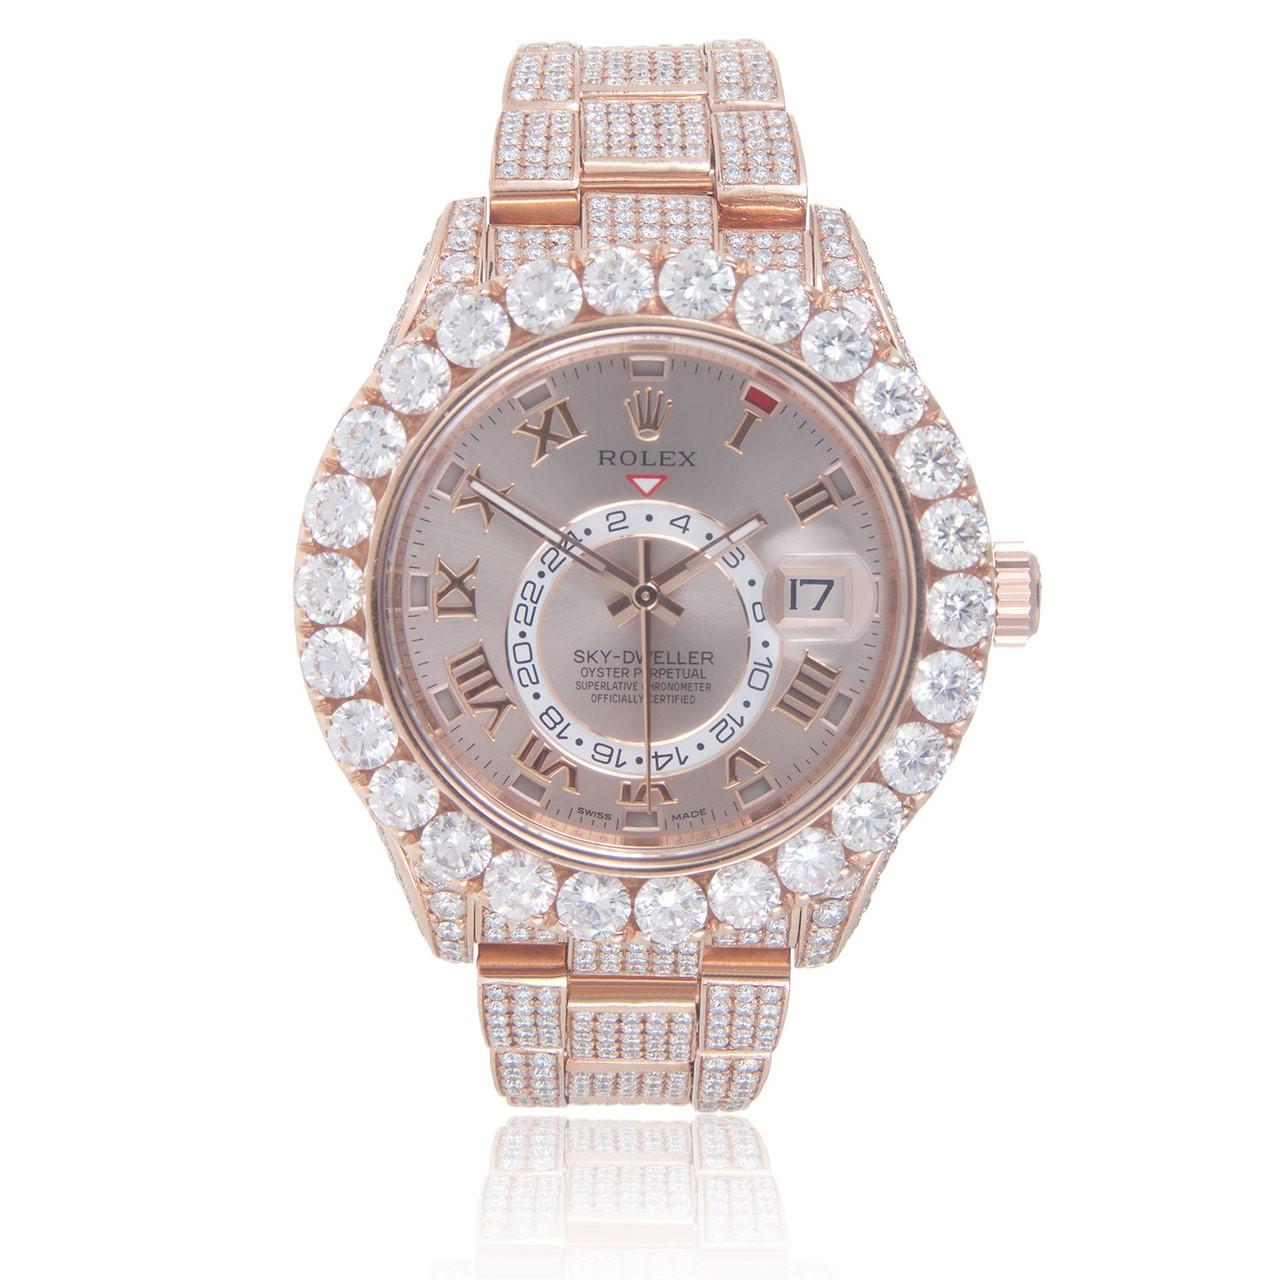 Rolex Sky,Dweller 18k Rose Gold 34ct Diamond Automatic Men\u0027s Watch